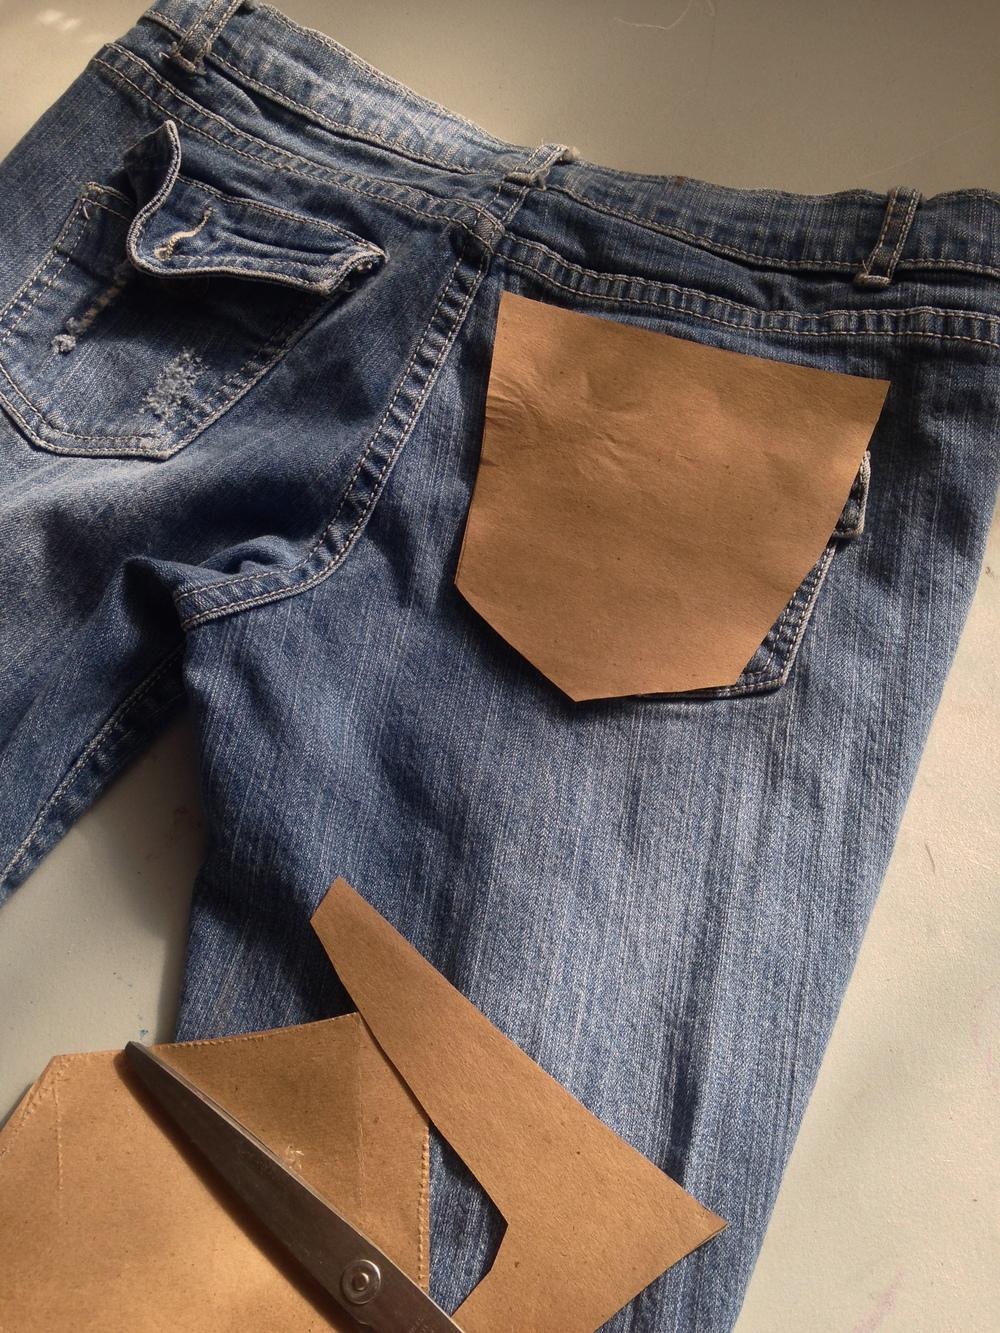 andrea-fenise-diy-sequin-pocket-jeans3